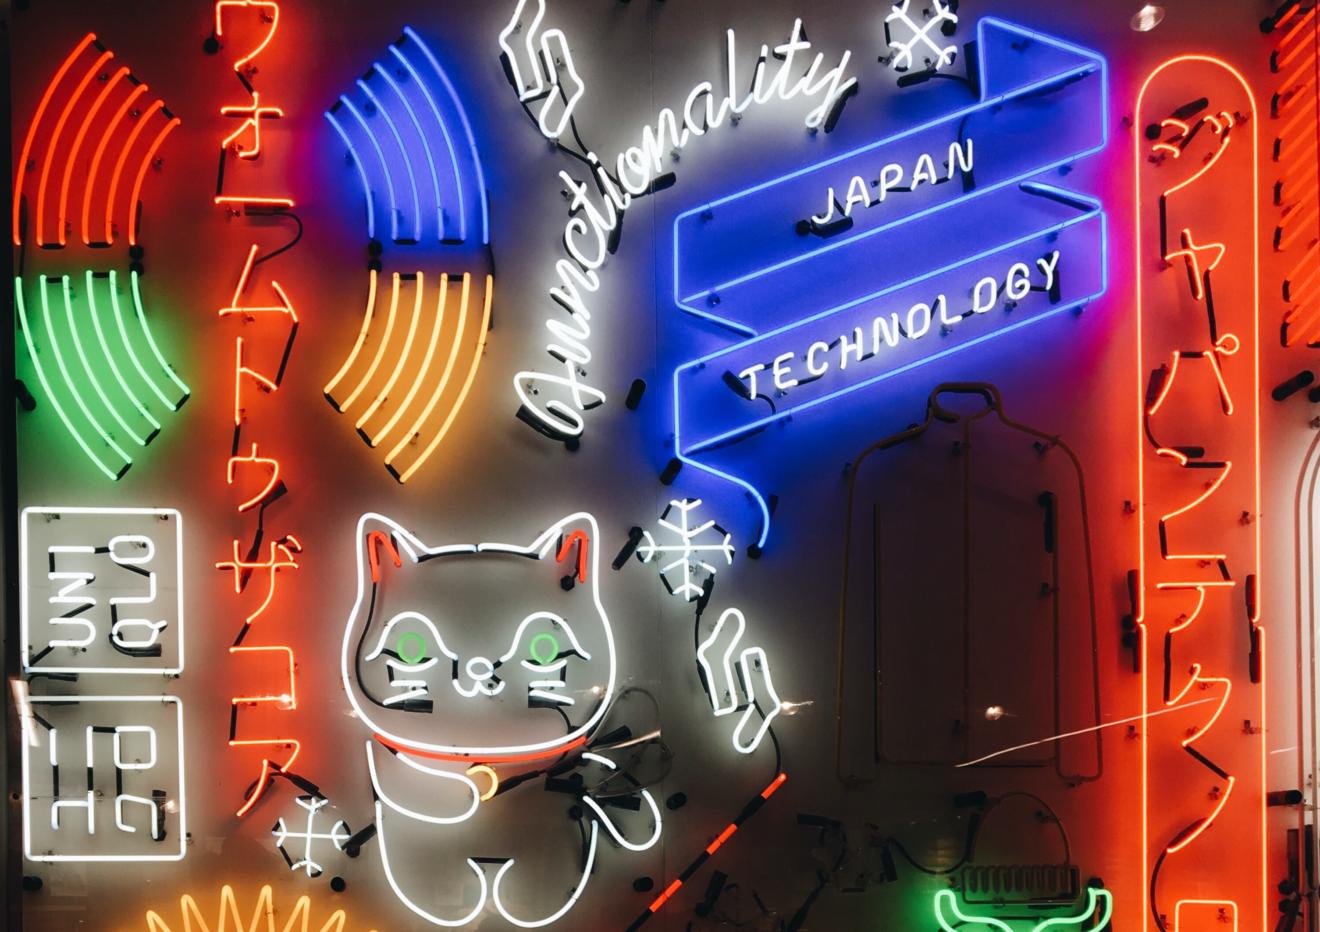 Japan_Technology_eddi-aguirre-o9iUbtfve1Q-unsplash-1